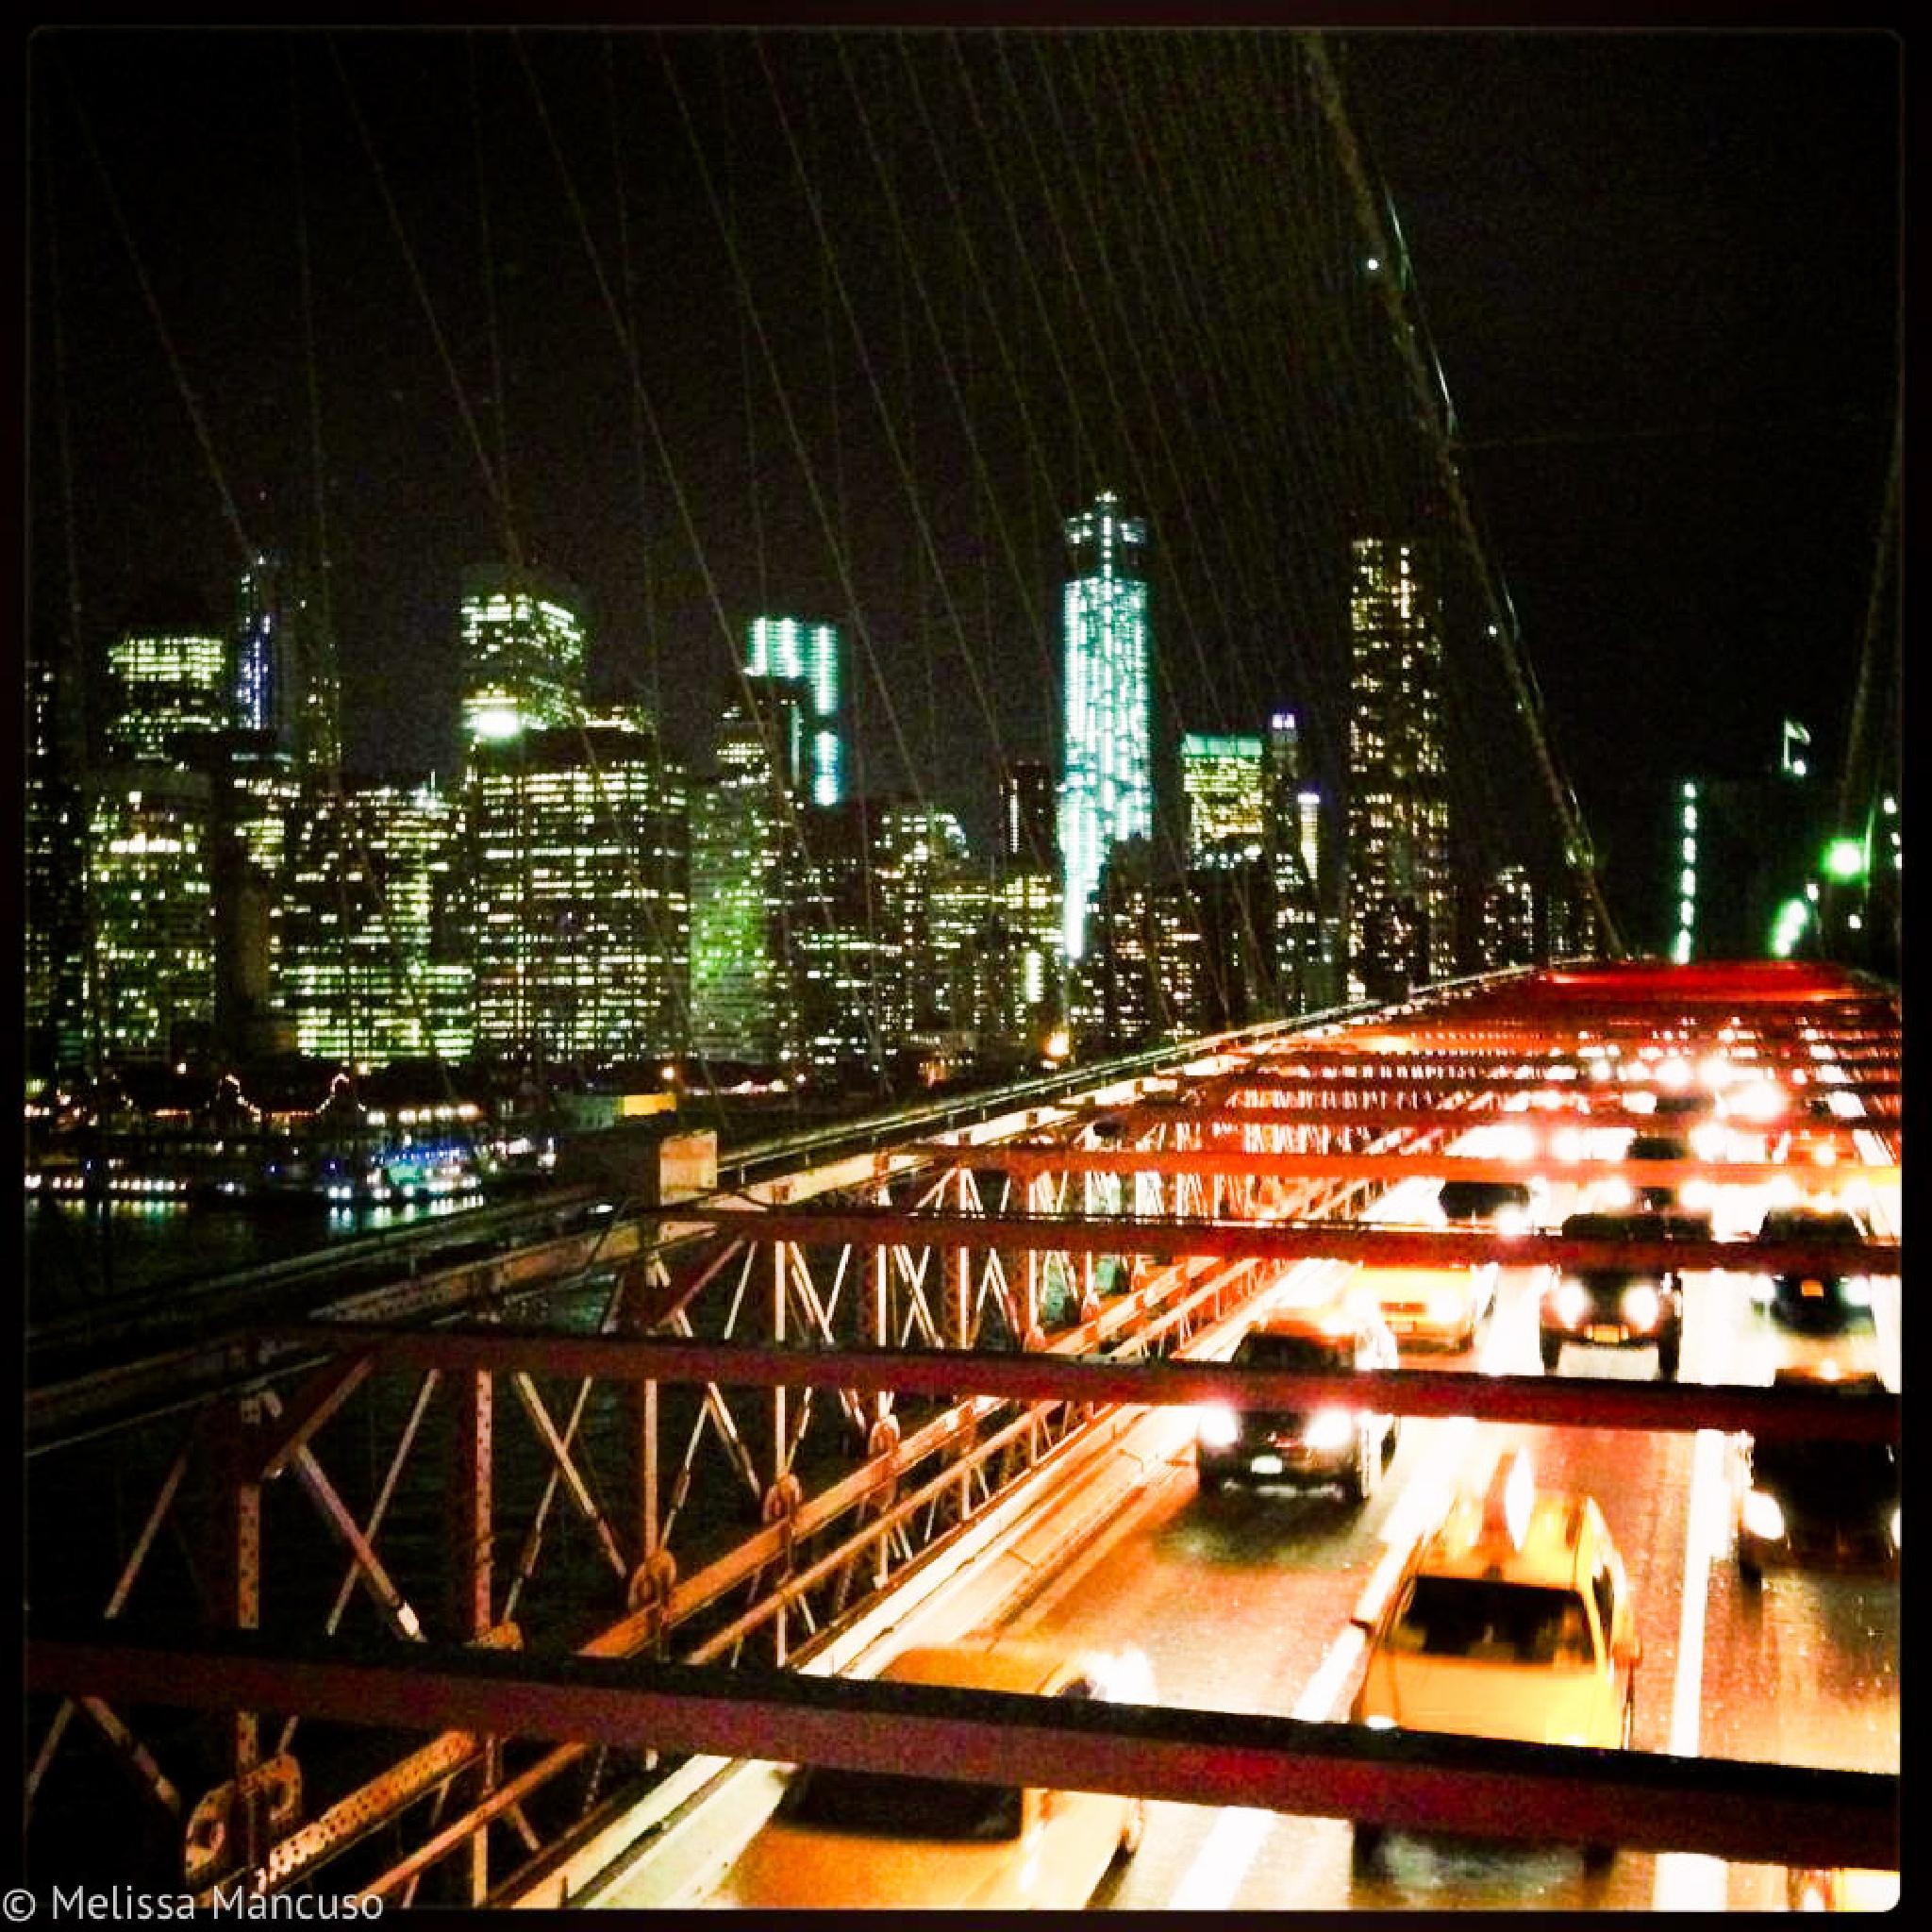 Just a bridge between us by Melissa Mancuso Photography